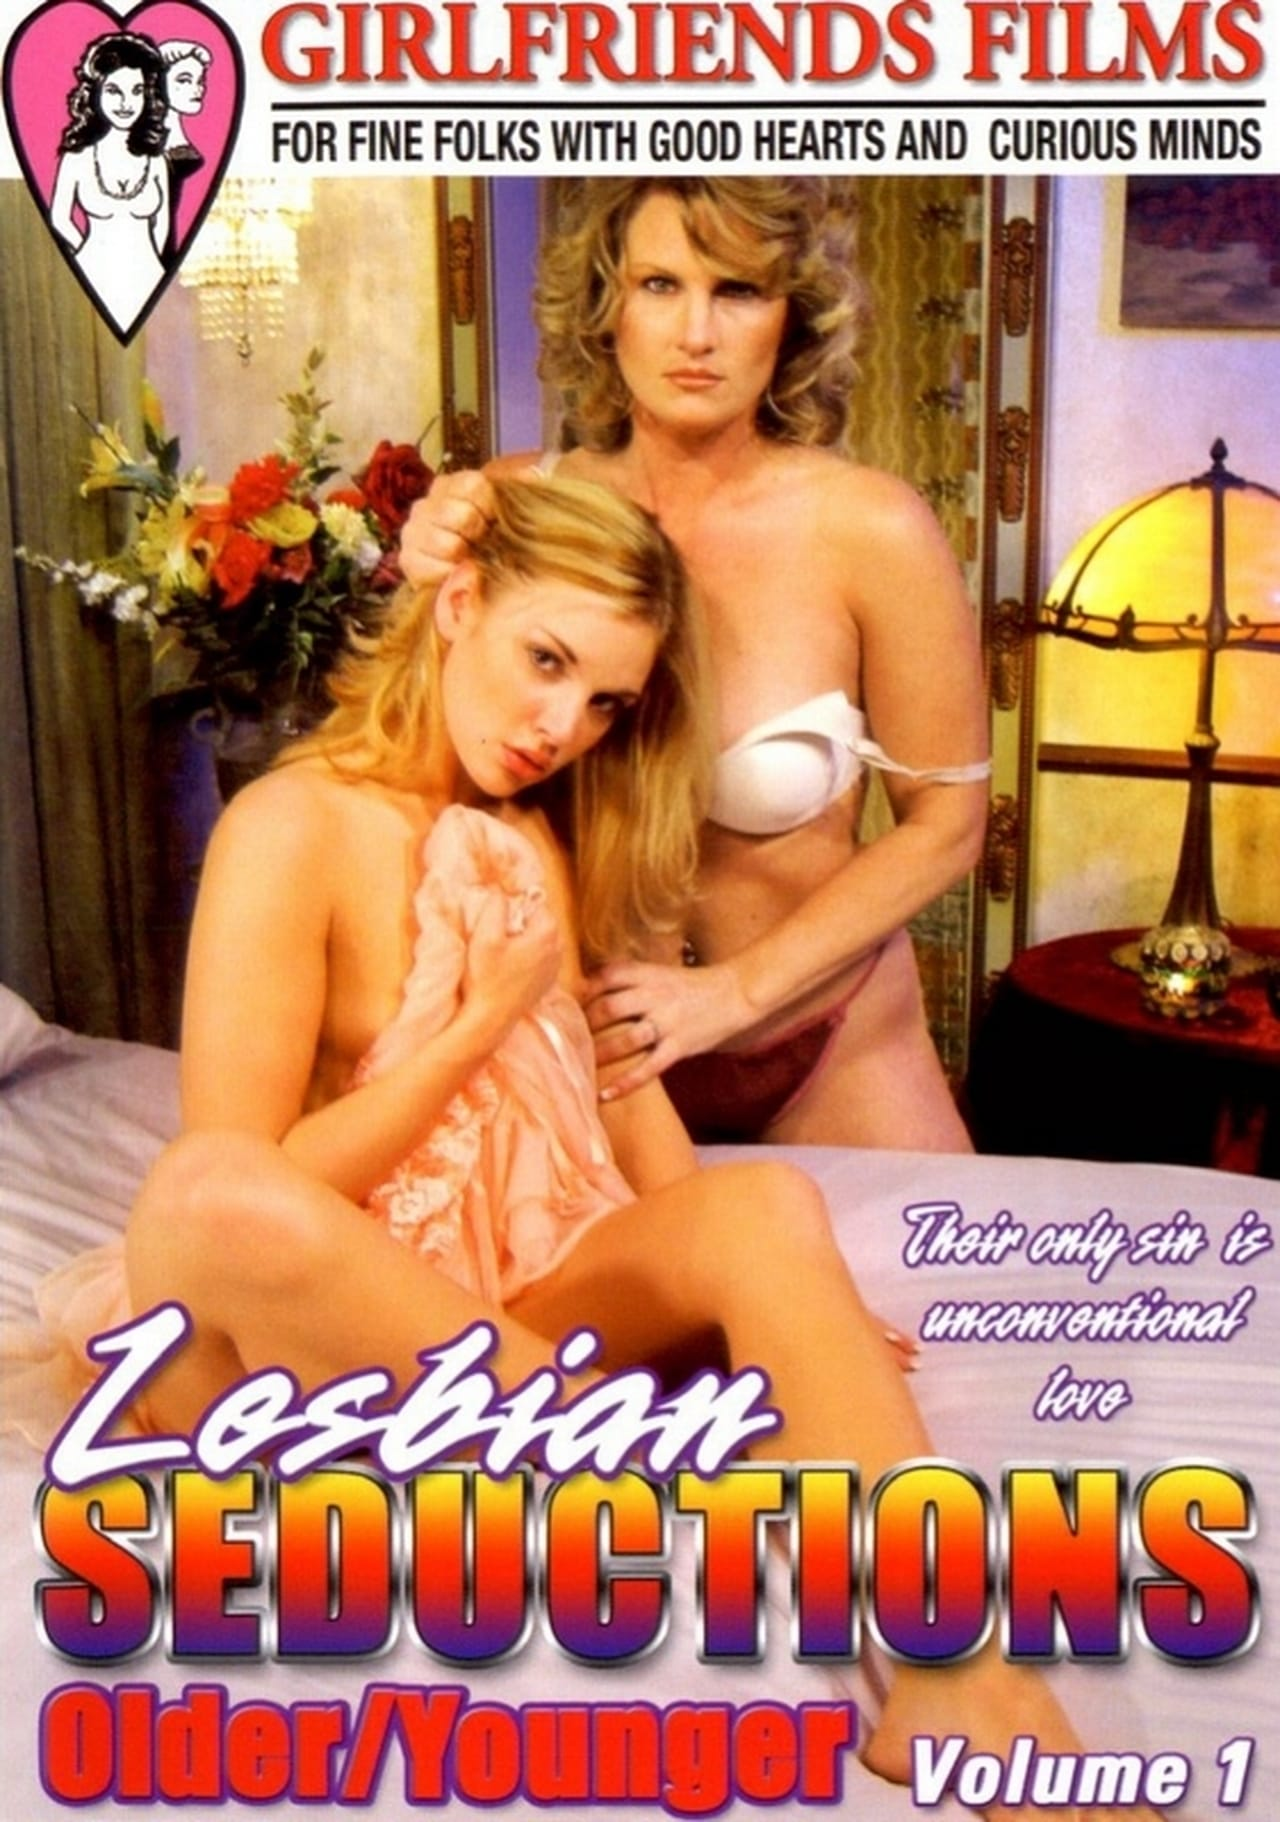 Lesbian Seductions: Older/Younger